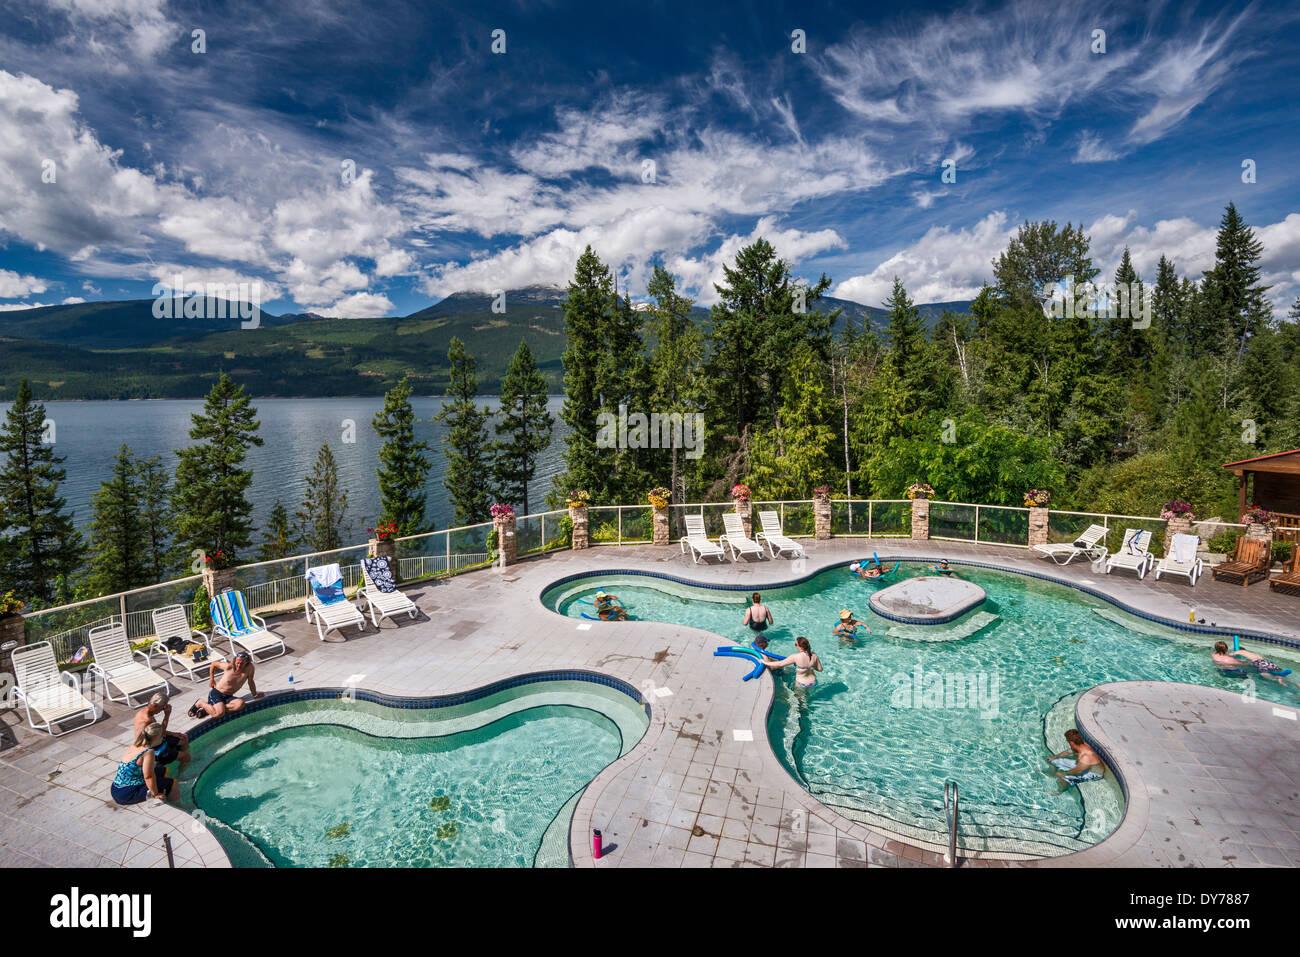 Jacuzzis al aire libre, en el Halcyon Hot Springs Resort and Spa, a través de la flecha superior, cerca del lago Nakusp, British Columbia, Canadá Foto de stock